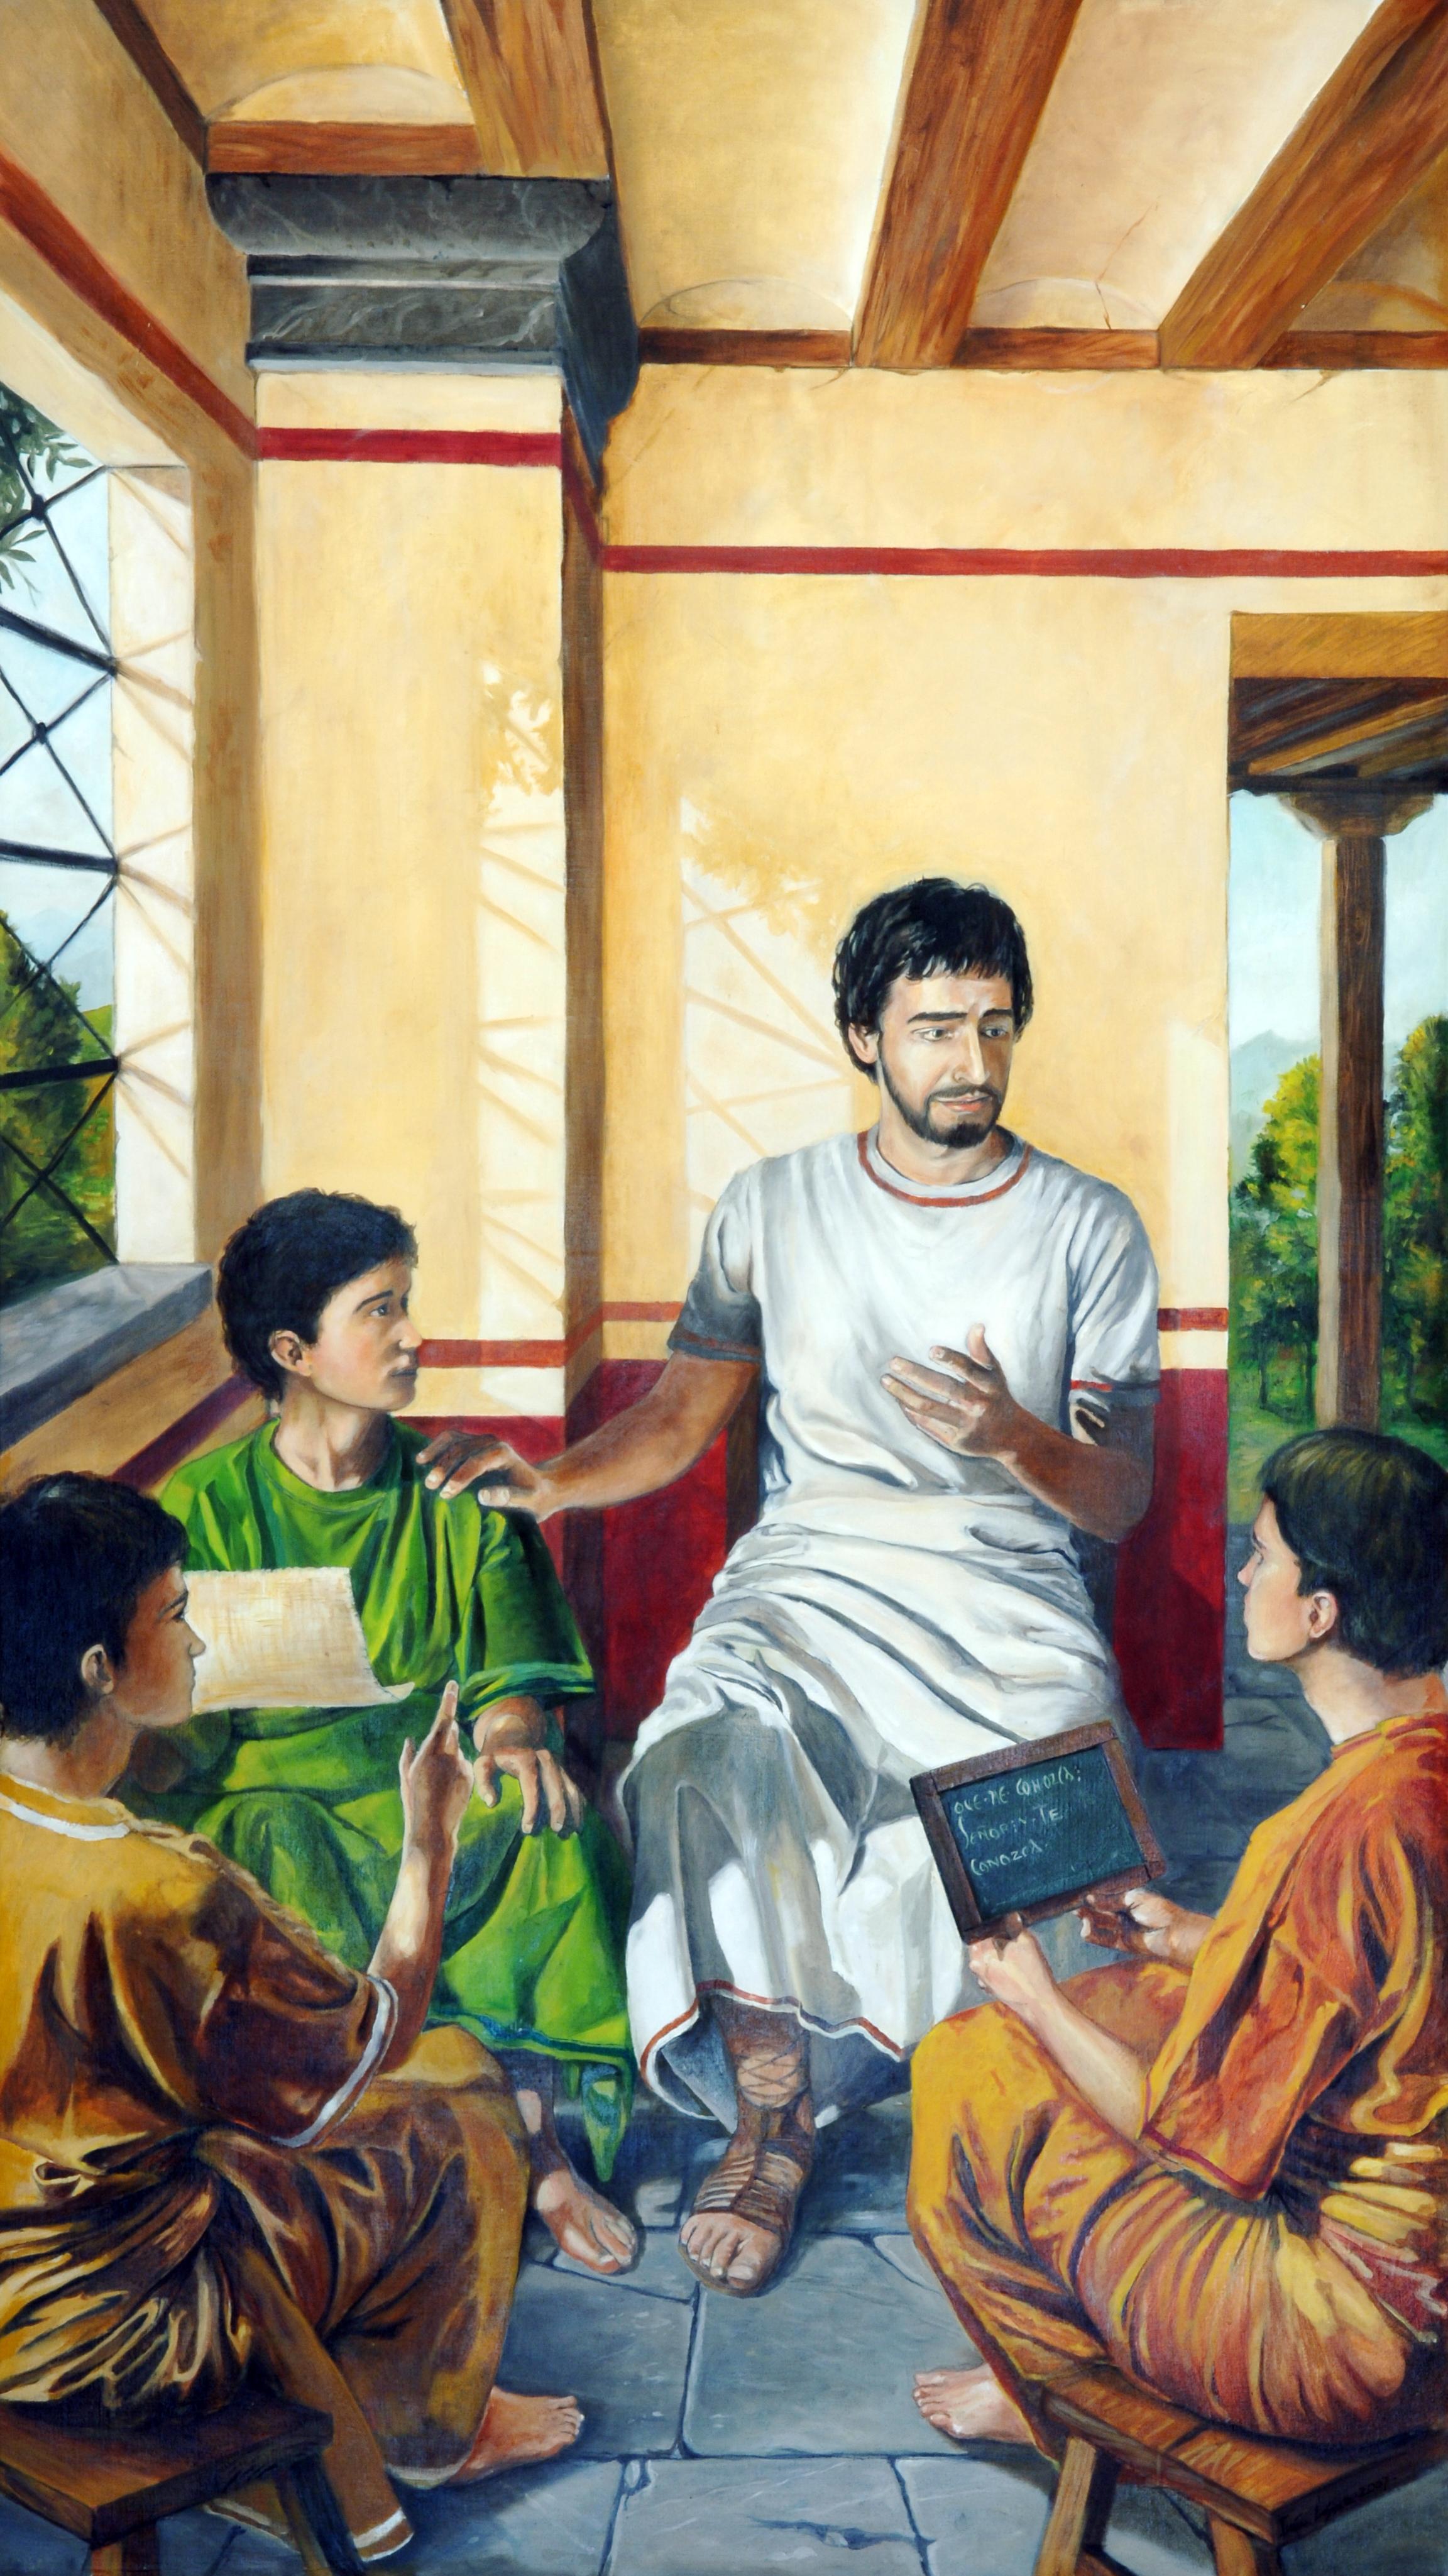 Augustine teacher, by Ivan Lopez. Las Rozas, Madrid, Spain.